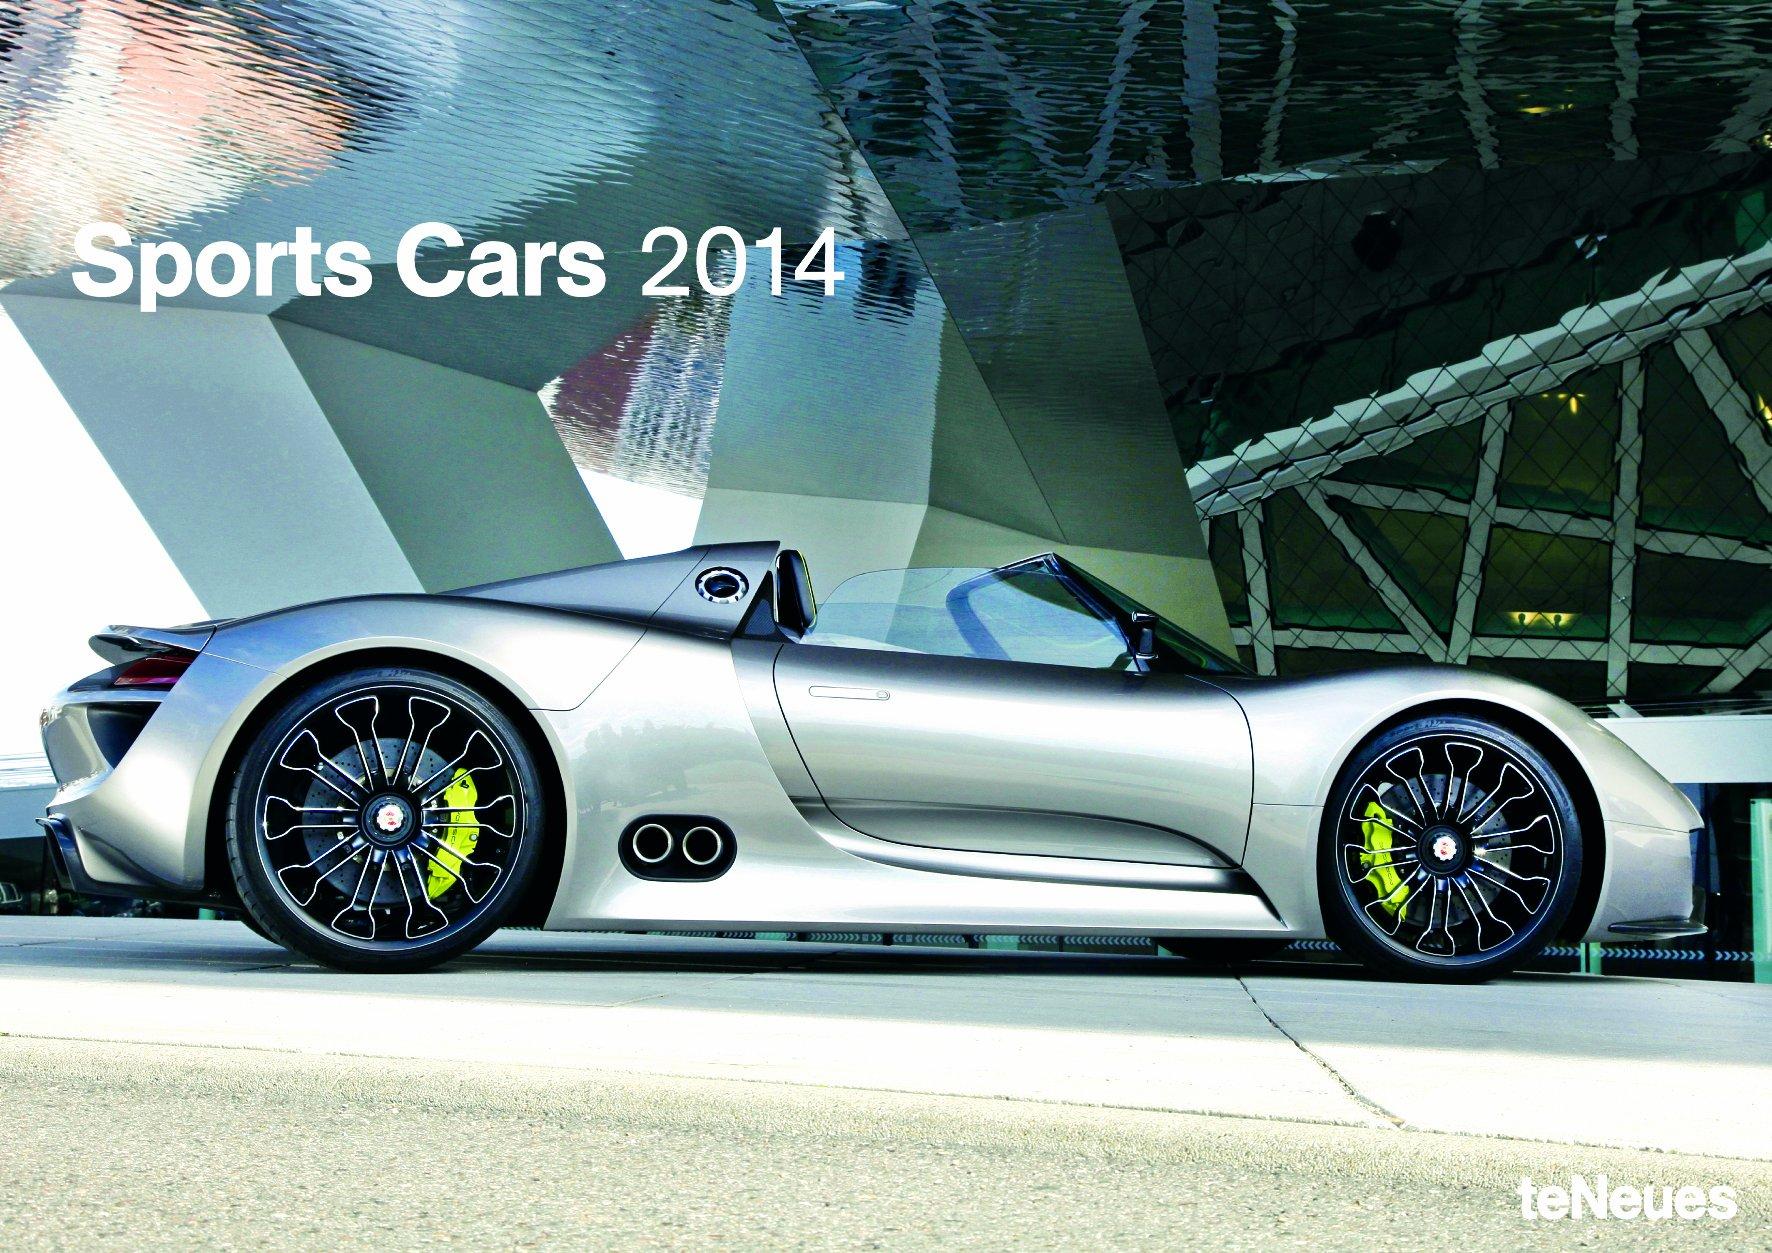 Sports Cars 2014